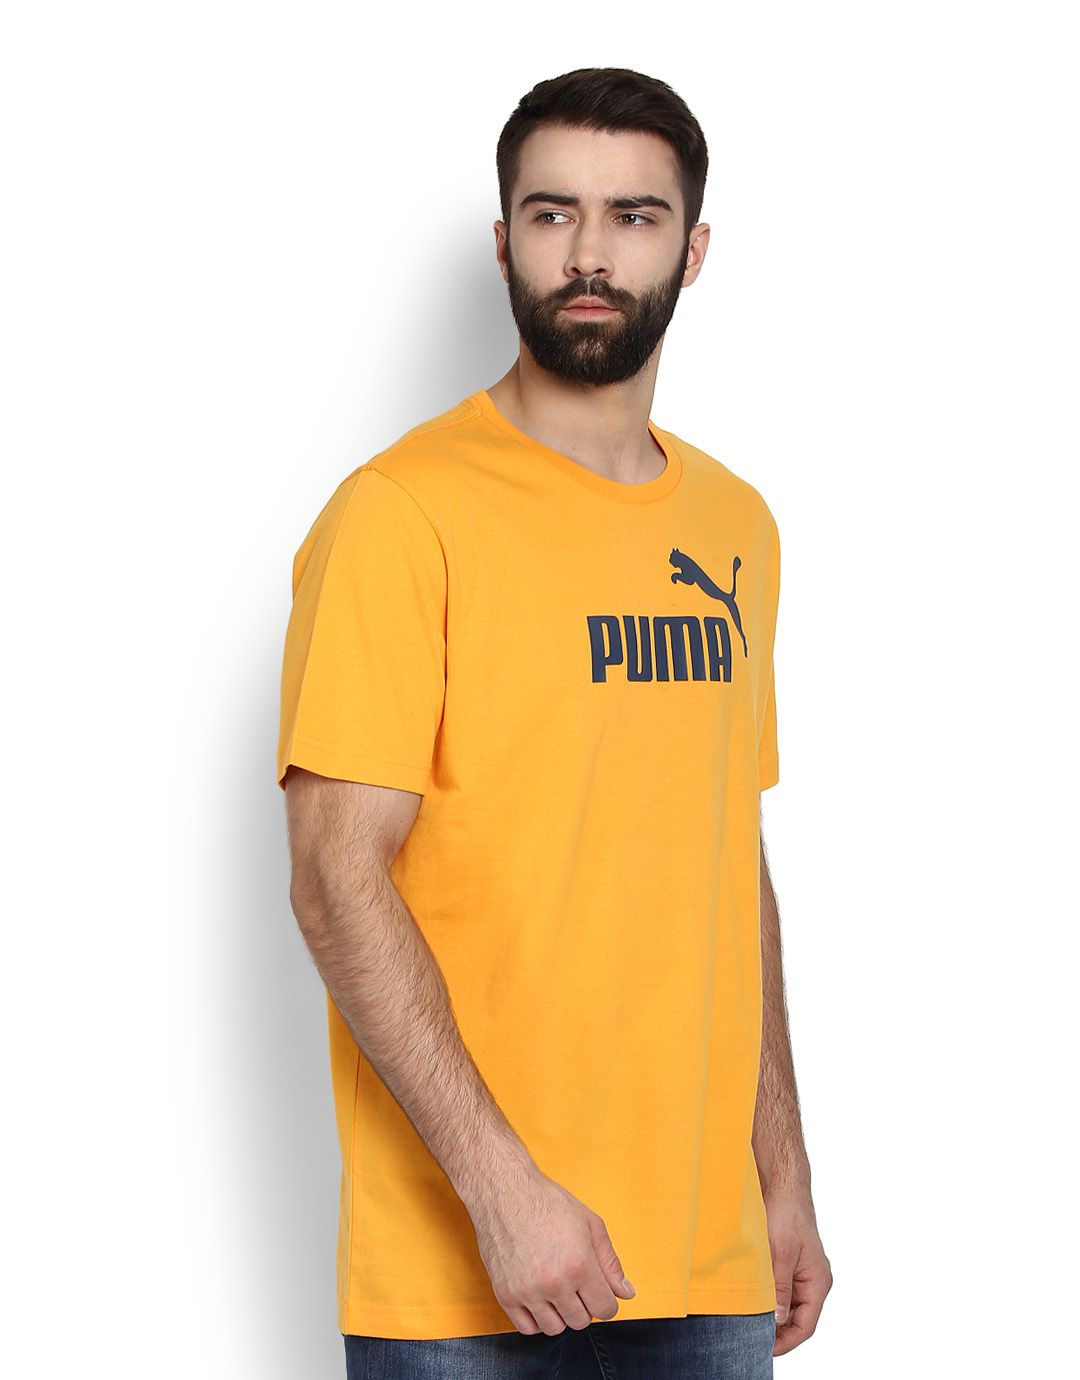 Puma Yellow T-Shirt